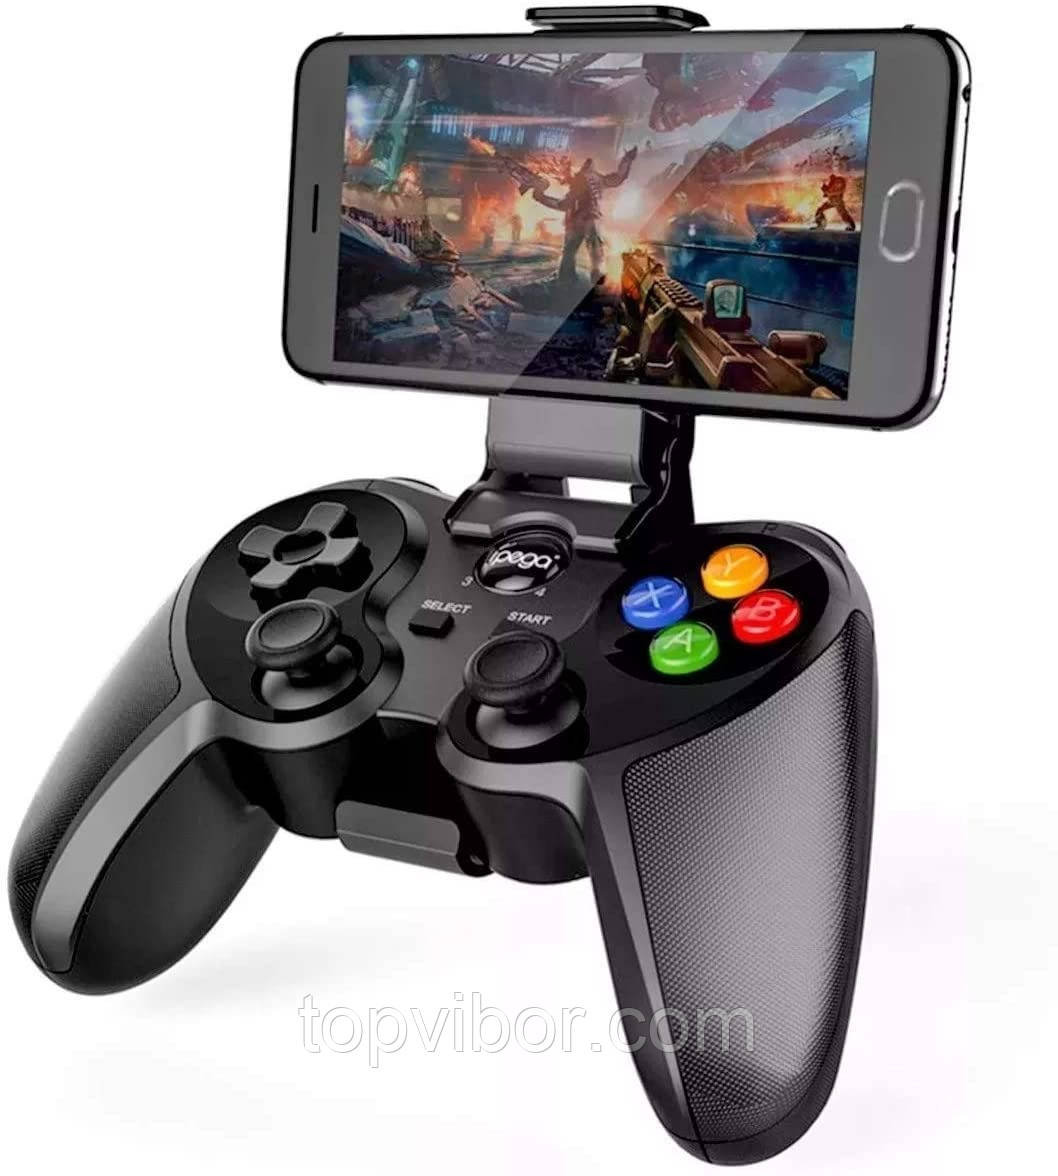 Геймпад для телефона (айфона/андроид) Ipega PG-9078, беспроводной джойстик для телевизора | джостік